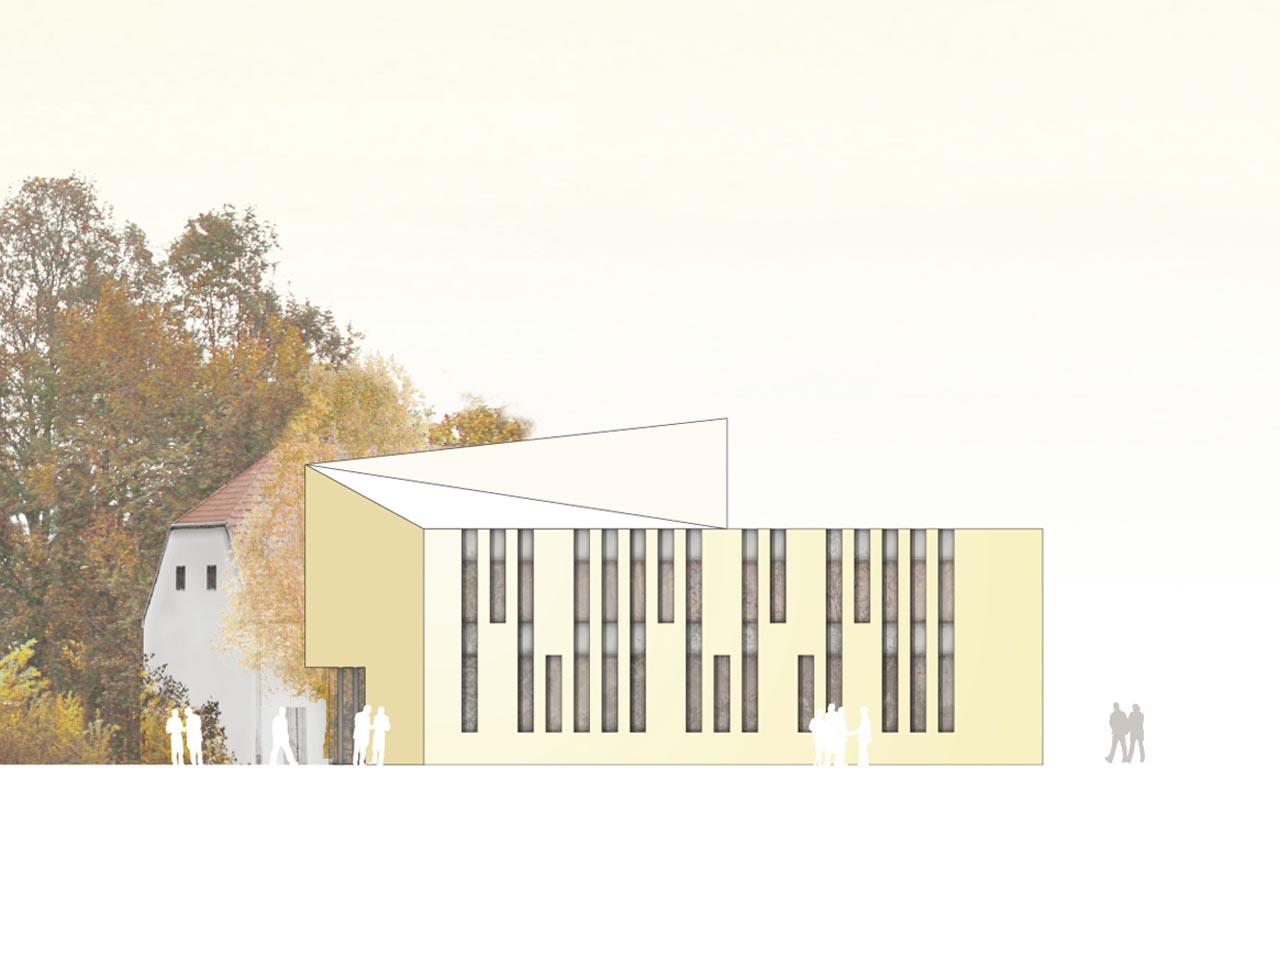 Wettbewerb Bürgerhaus Happing